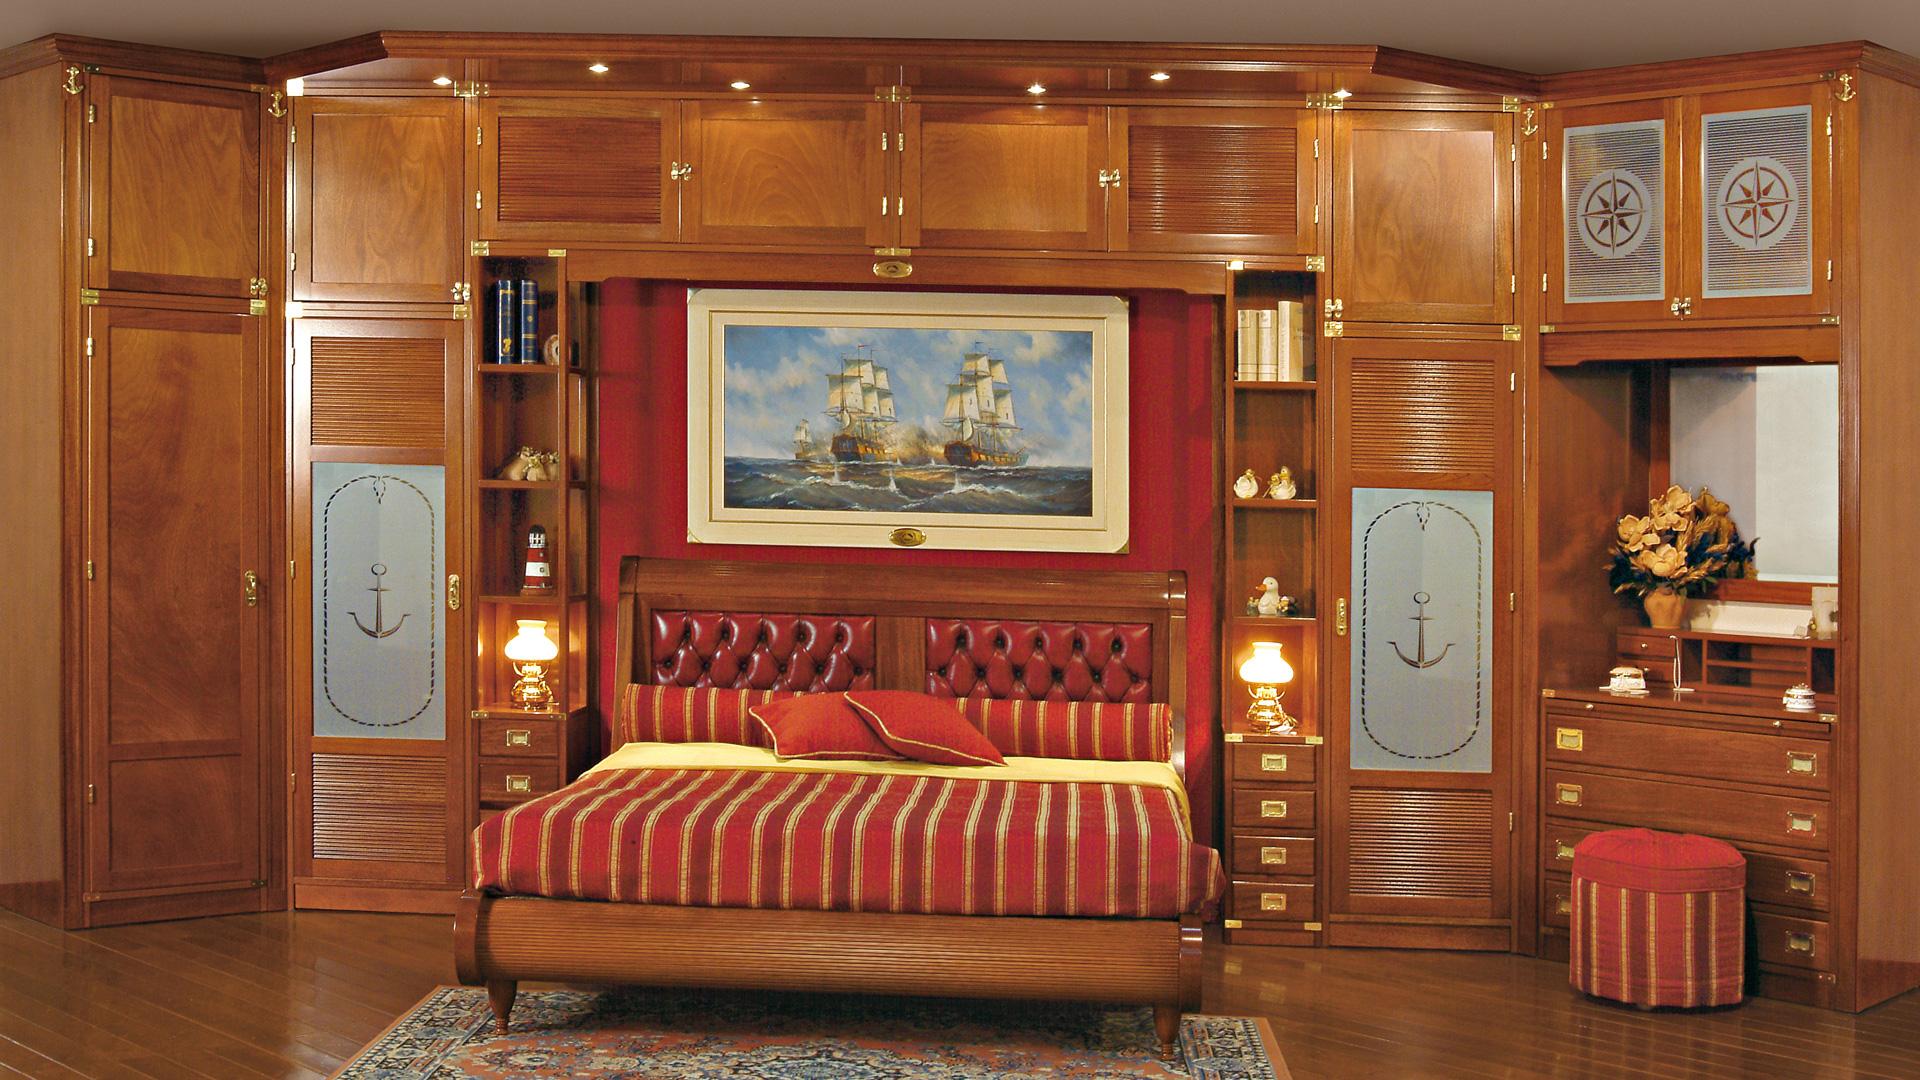 Top camerette in stile vecchia marina caroti with camerette stile inglese - Camere da letto stile country ...